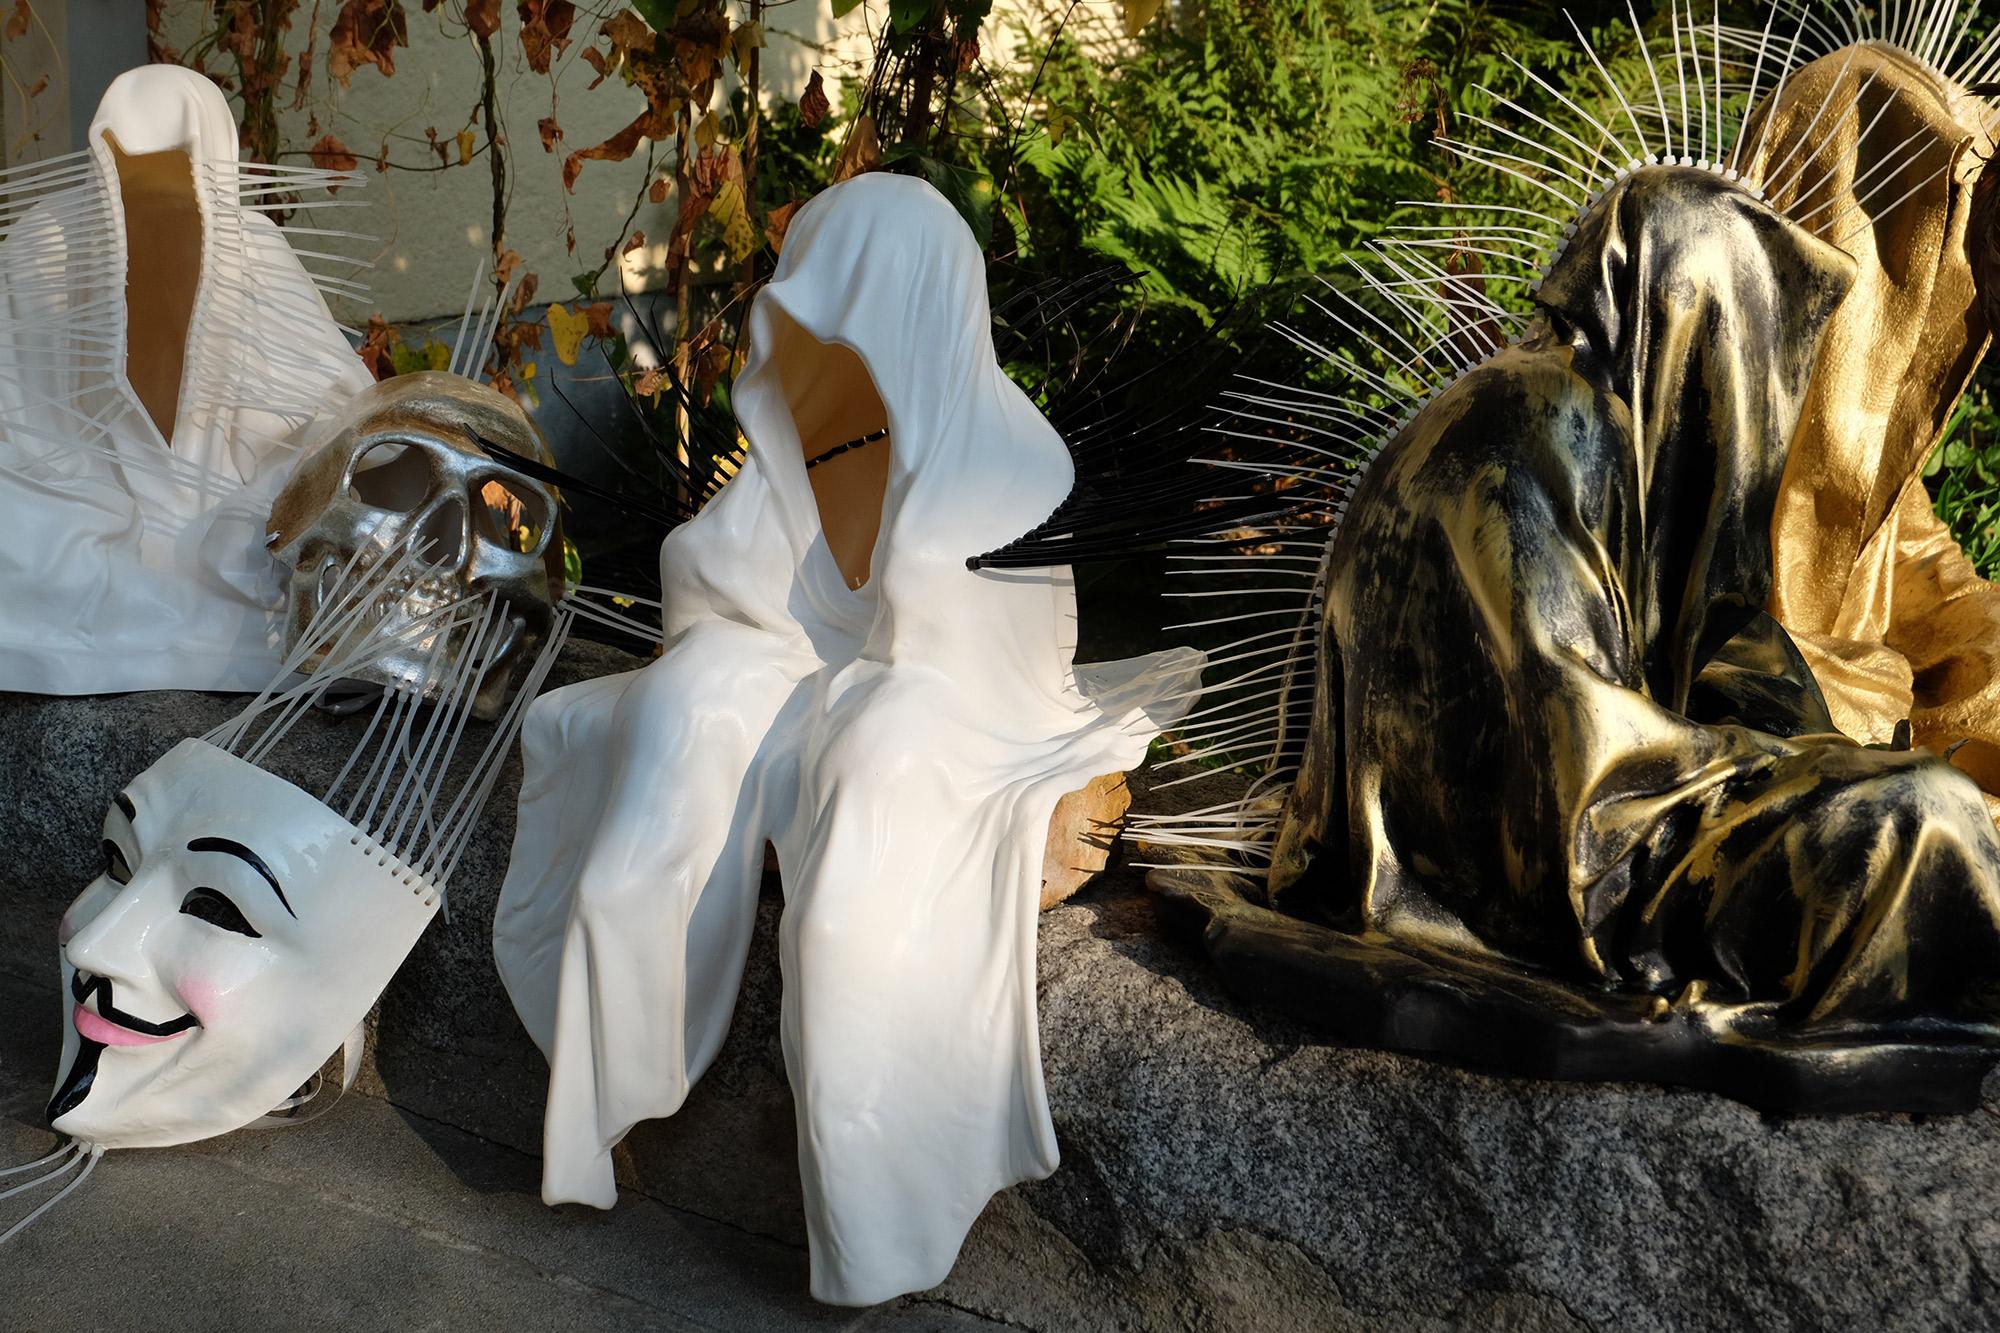 #faceless-#mask-#cableties-#ziptie-ty-#guardiansoftime-#manfredkielnhofer-#contemporaryart-#arts-#design-#sculpture-#statue-#museum-#gallery-#fineart-#lightart-#ghost-#anonymous-8143